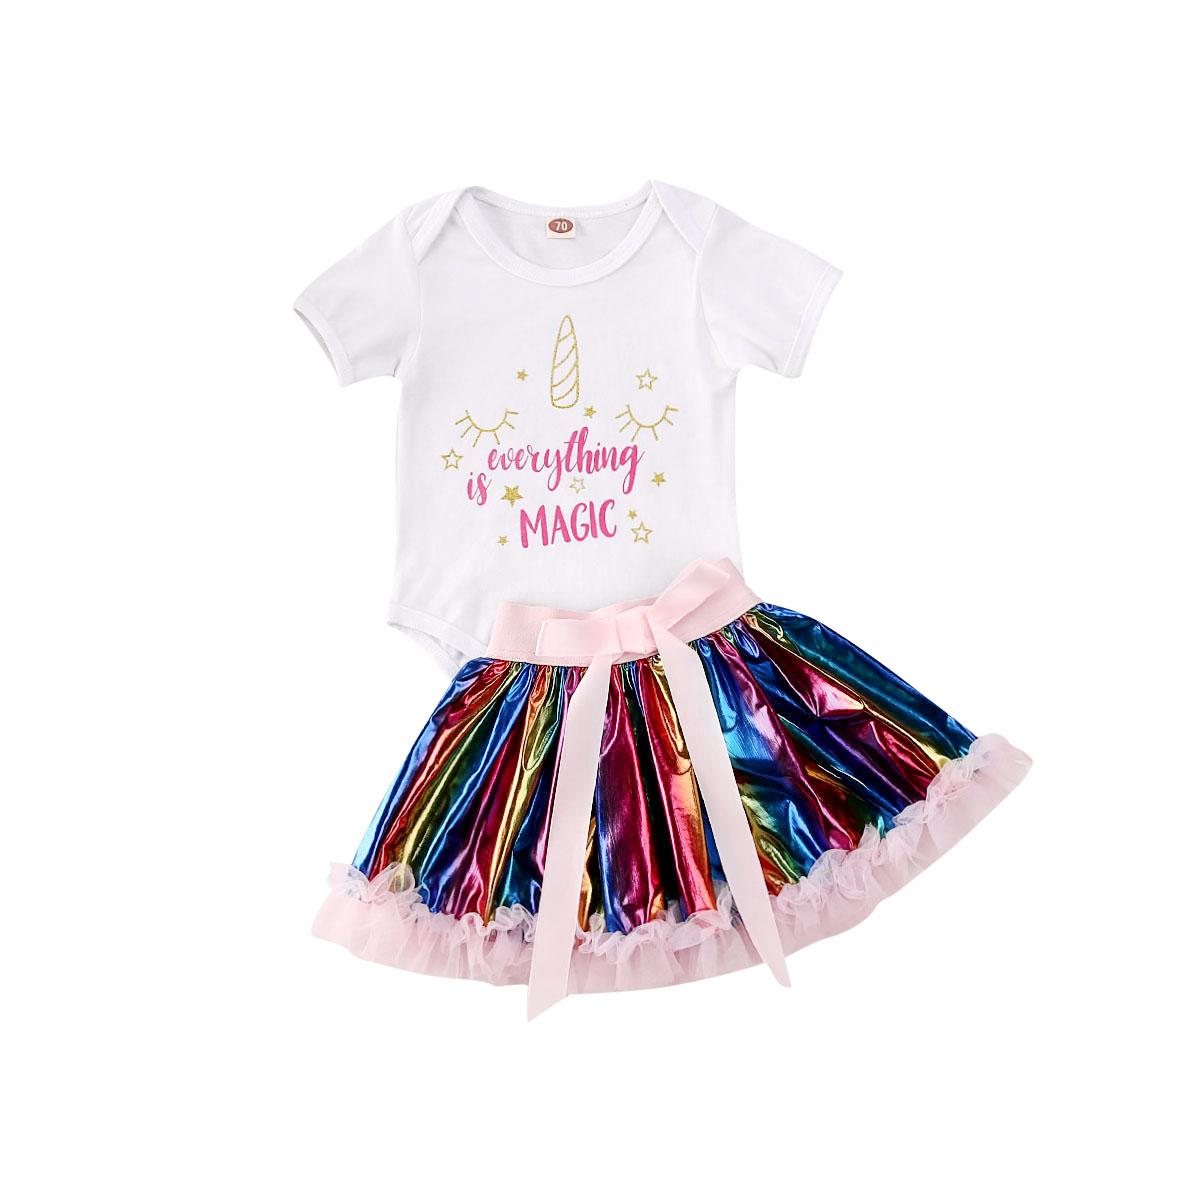 2PCS Summer Newborn Baby Girls Clothes Sets Princess Cartoon Print Bodysuit Jumpsuit+Colorful Tutu Skirt Girls Cotton Outfit